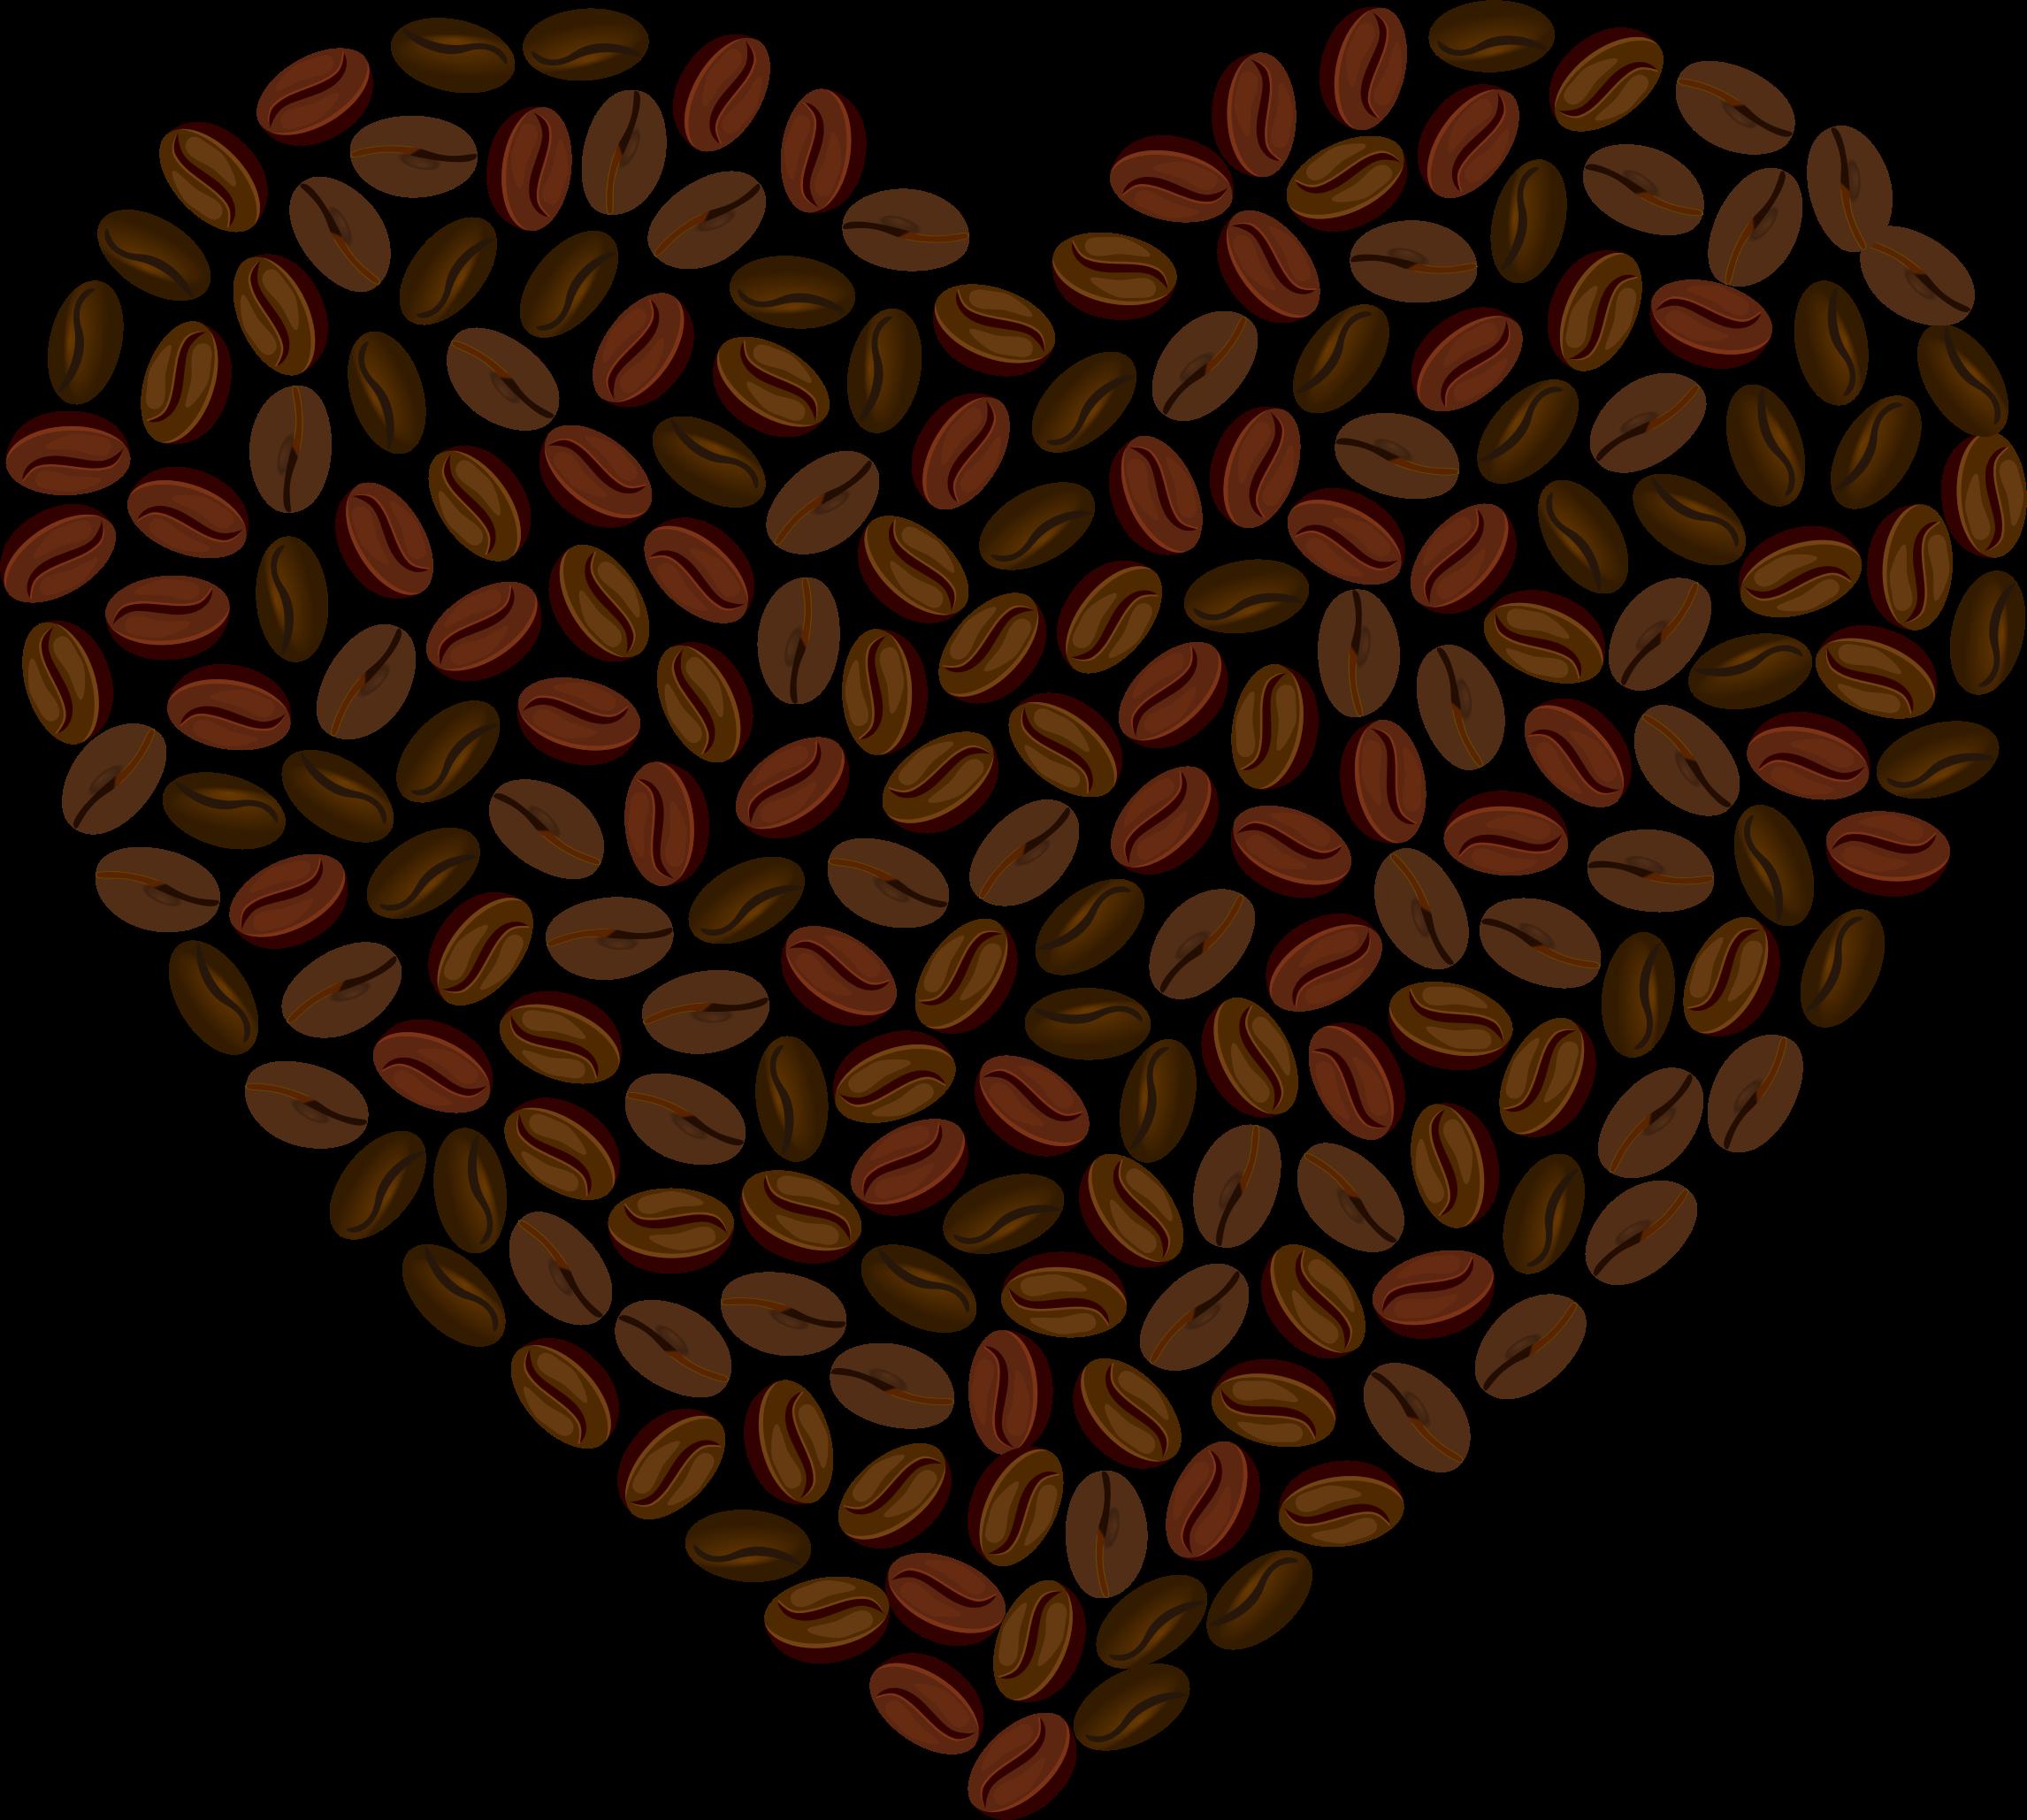 Coffee heart clipart banner transparent Clipart - Coffee Heart banner transparent